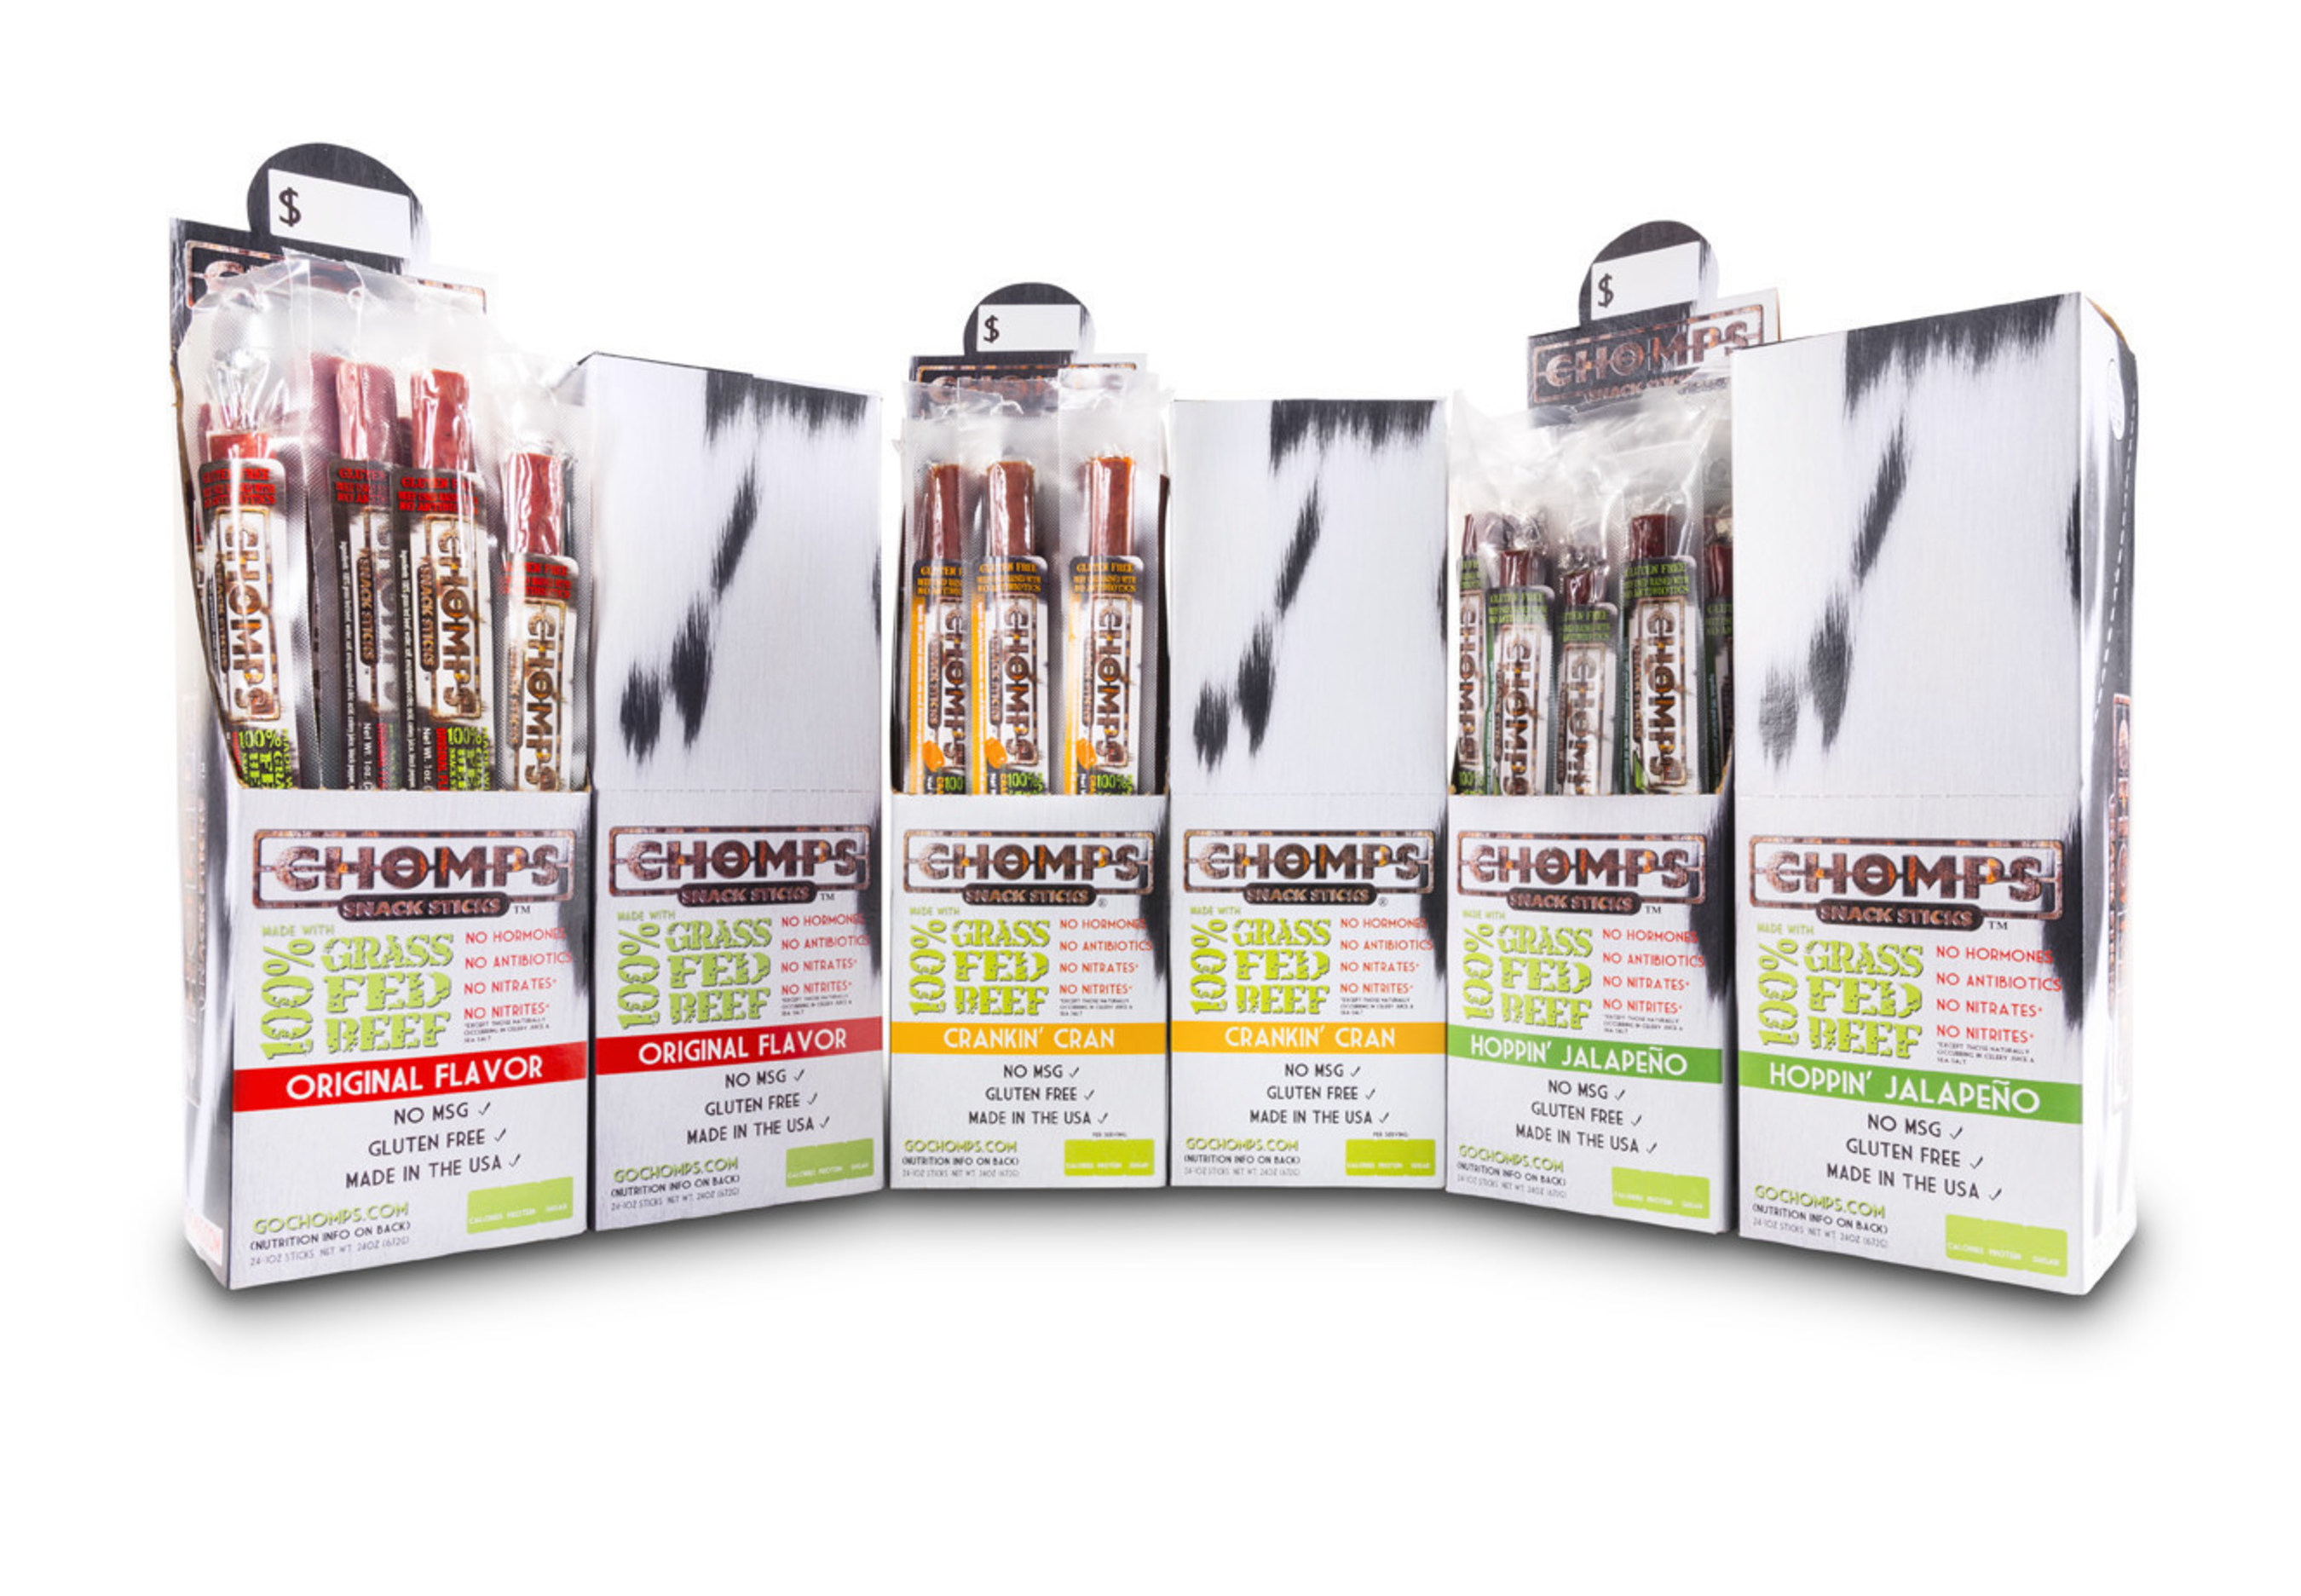 Chomps Snack Sticks Celebrates New Crankin' Cran Flavor